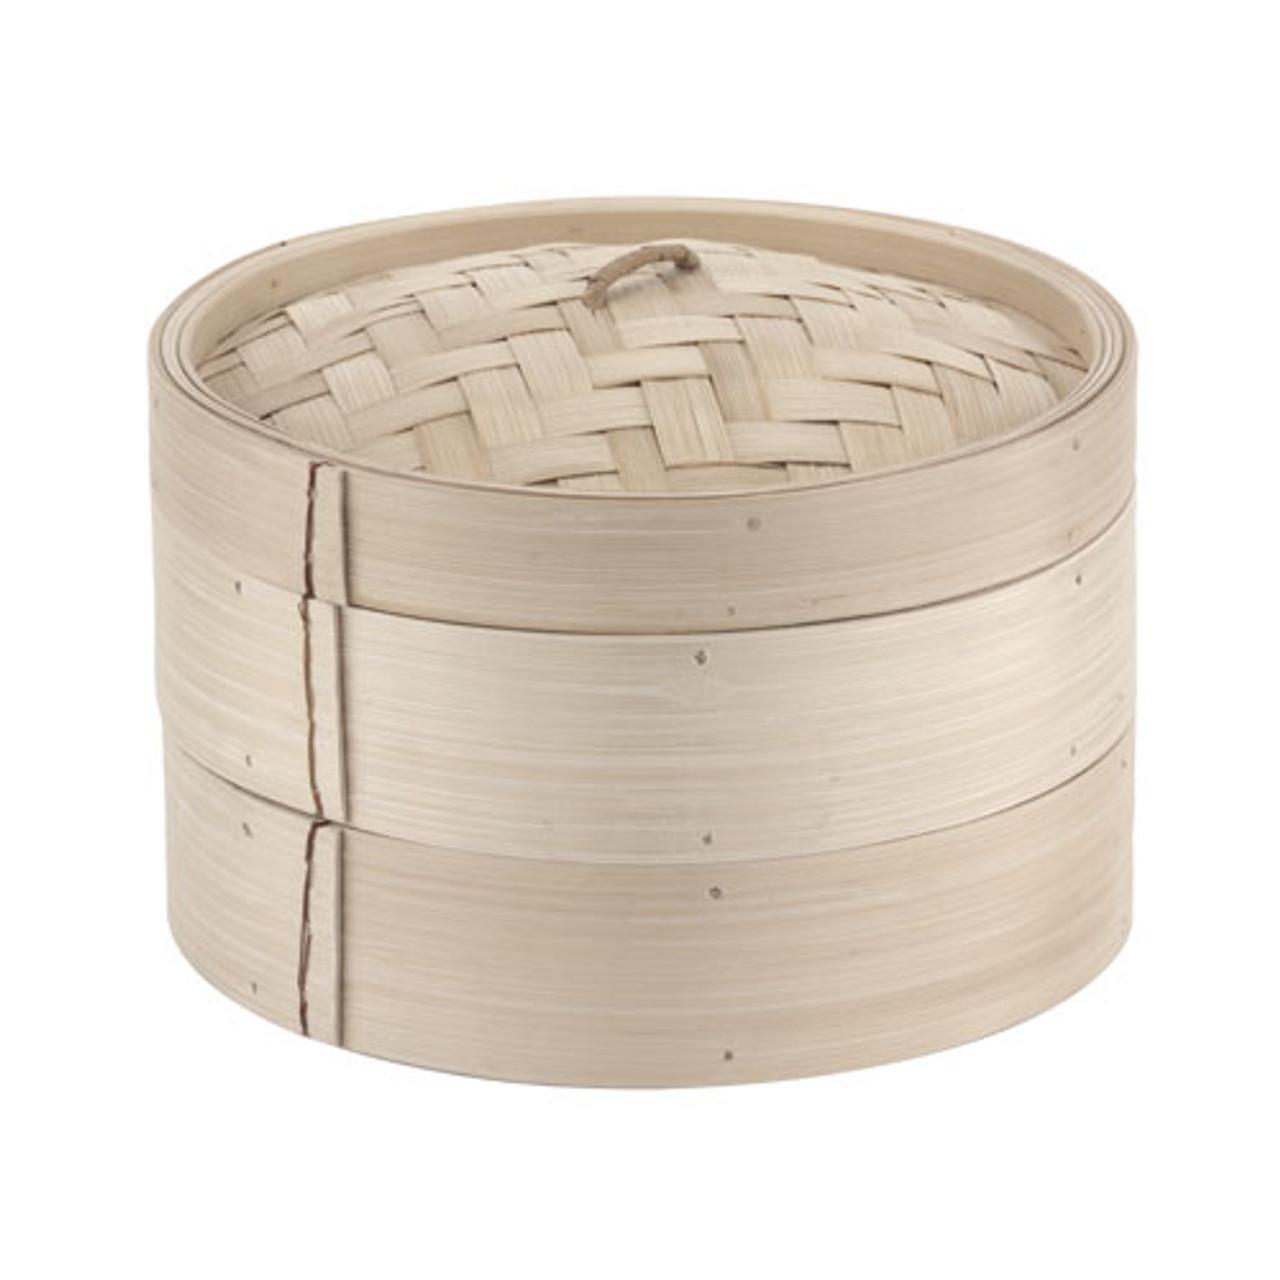 11 7/8 Bamboo Steamer Set (2+1), L 11.875 x W 11.875 x H 6.25